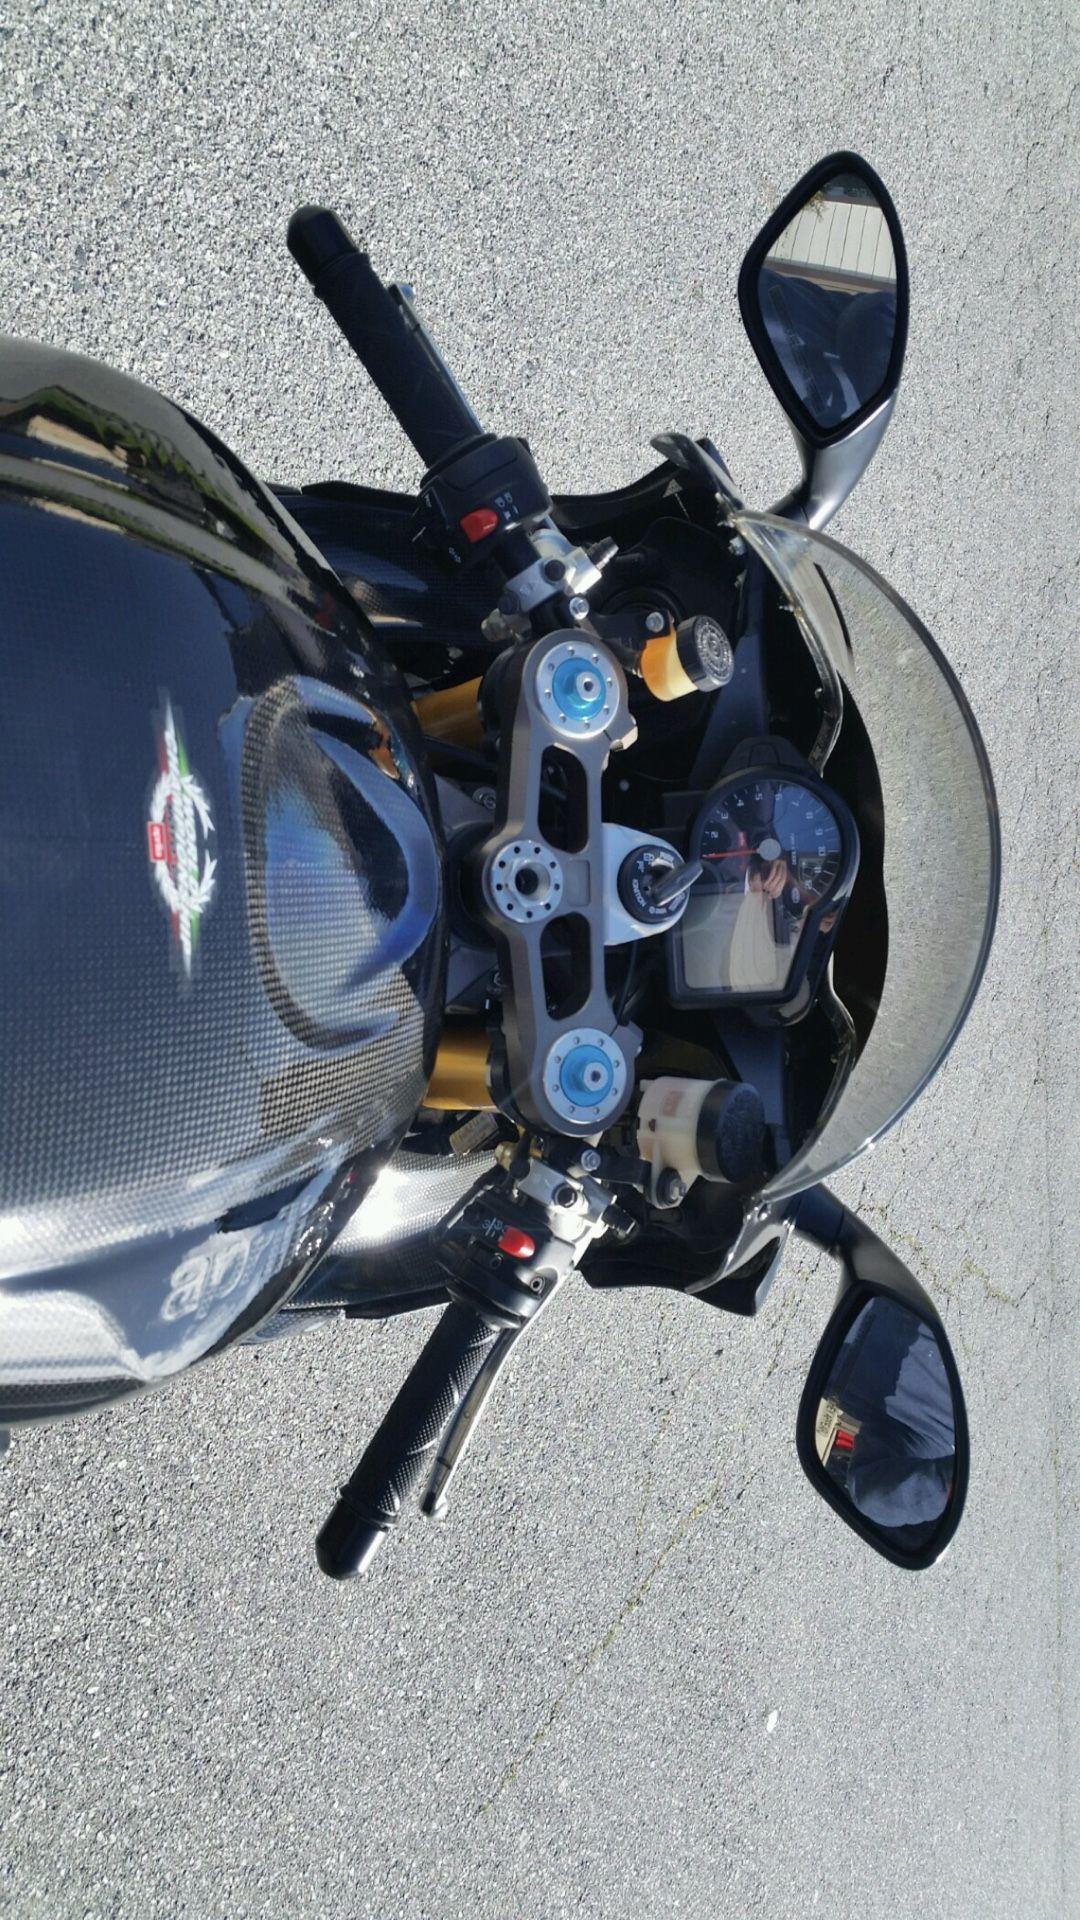 2004 Aprilia RSV1000 NERA. 1200 miles. 1 of 200 made. all Carbon fiber. OHLINS suspension. Magnesium Wheels, triple clamp, cases. $12,000 Best offer